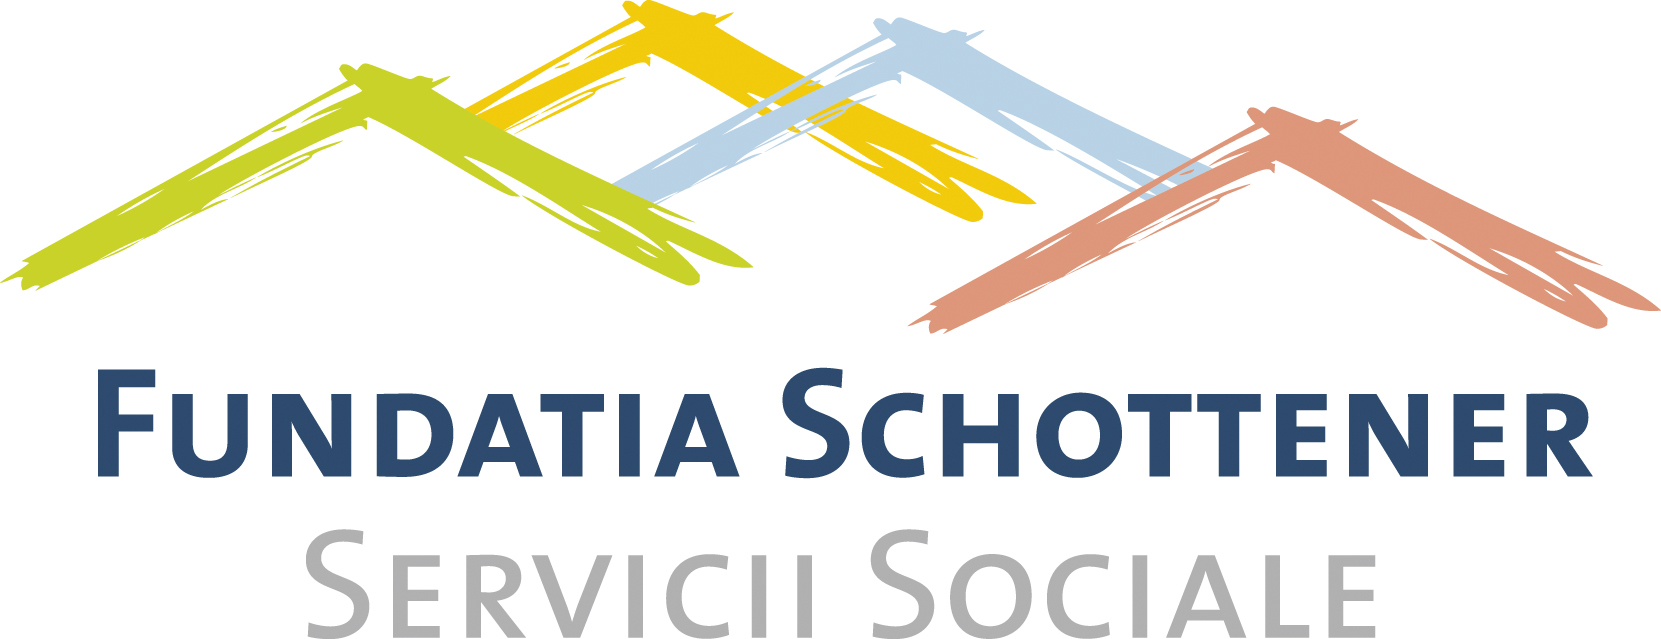 Fundatia Schottener Servicii Sociale  logo